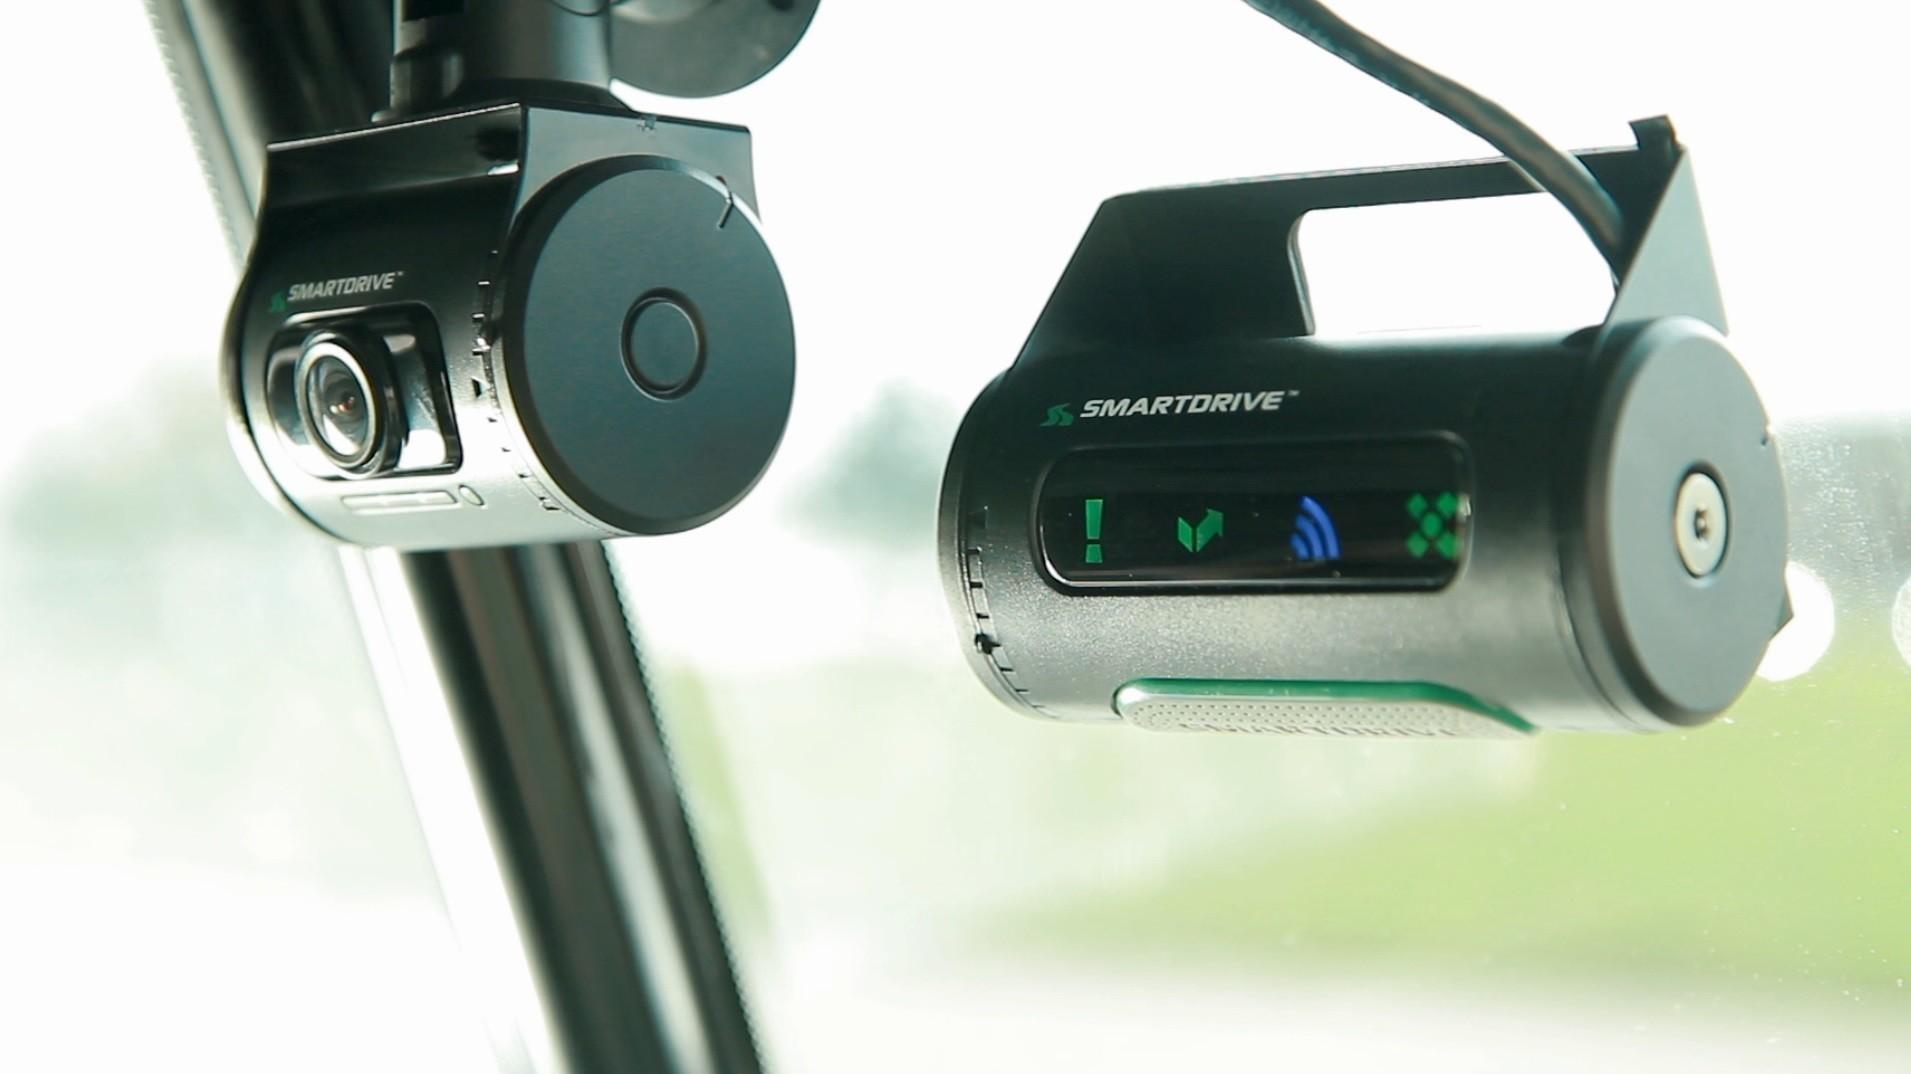 Lytx smartdrive add customers as more truck fleets tap in cab lytx smartdrive add customers as more truck fleets tap in cab video to improve safety the san diego union tribune buycottarizona Gallery